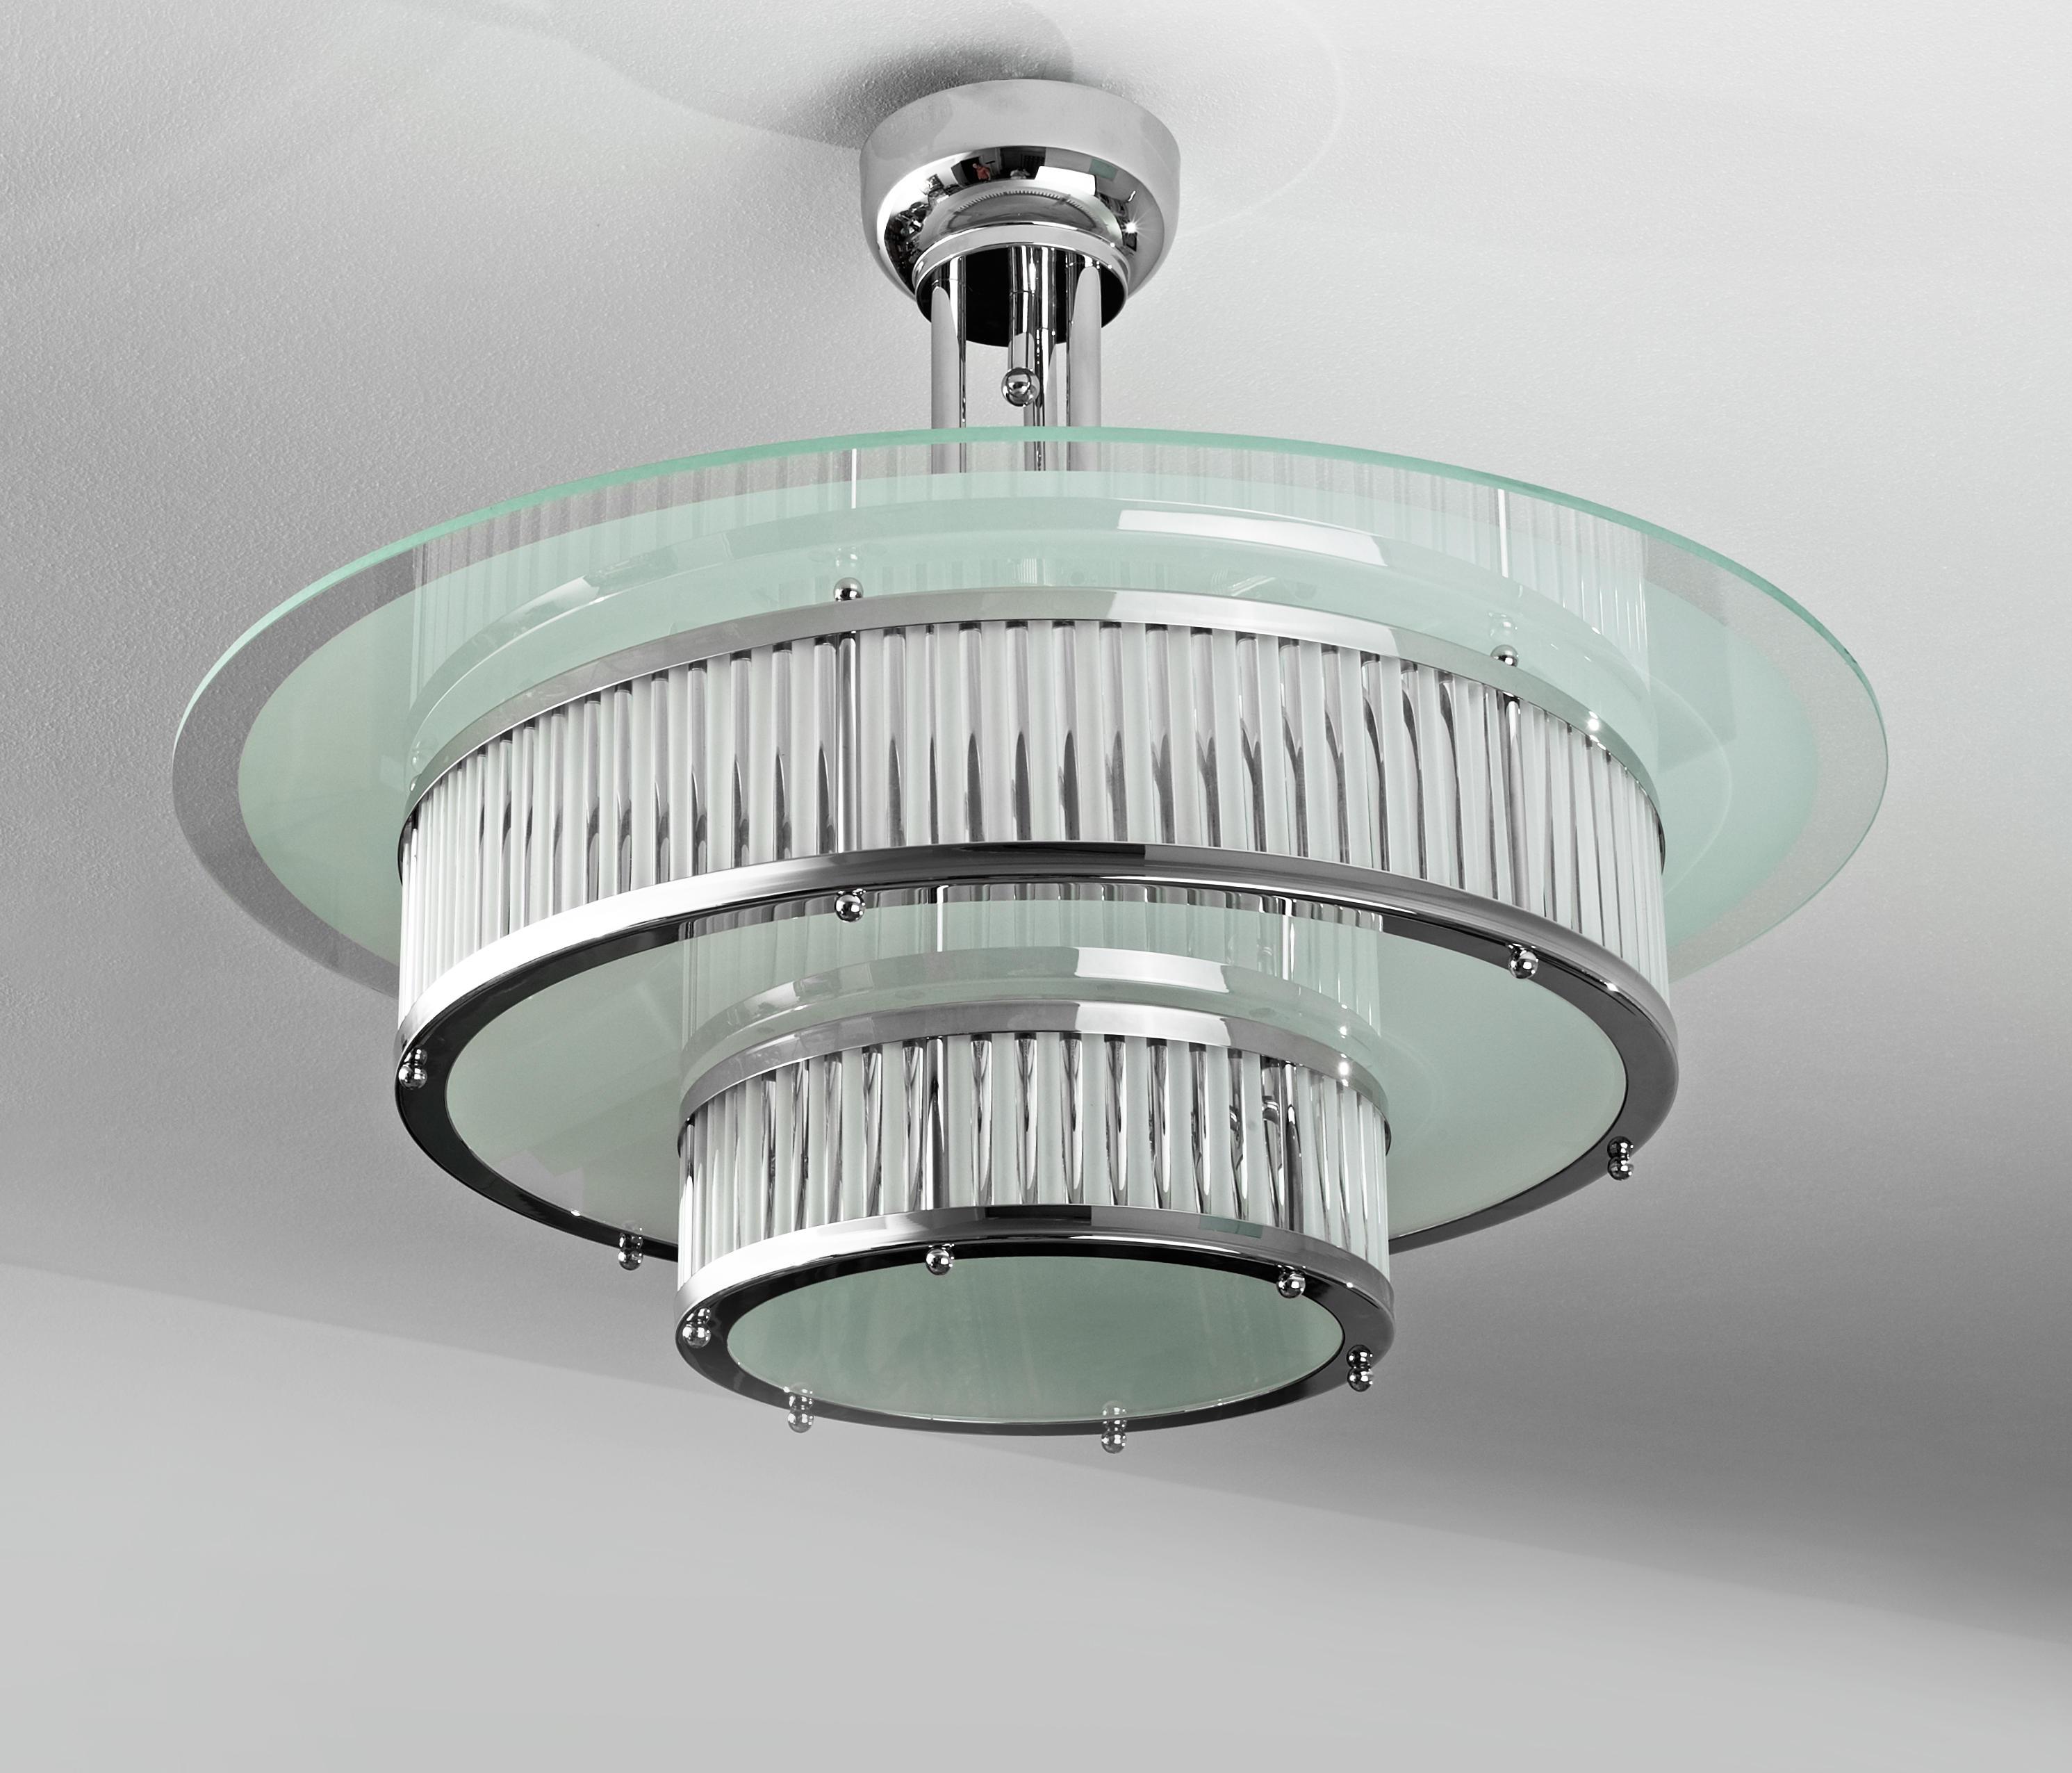 ceilings chandelier restored mod ceiling factory steampunk product light deco art lamp